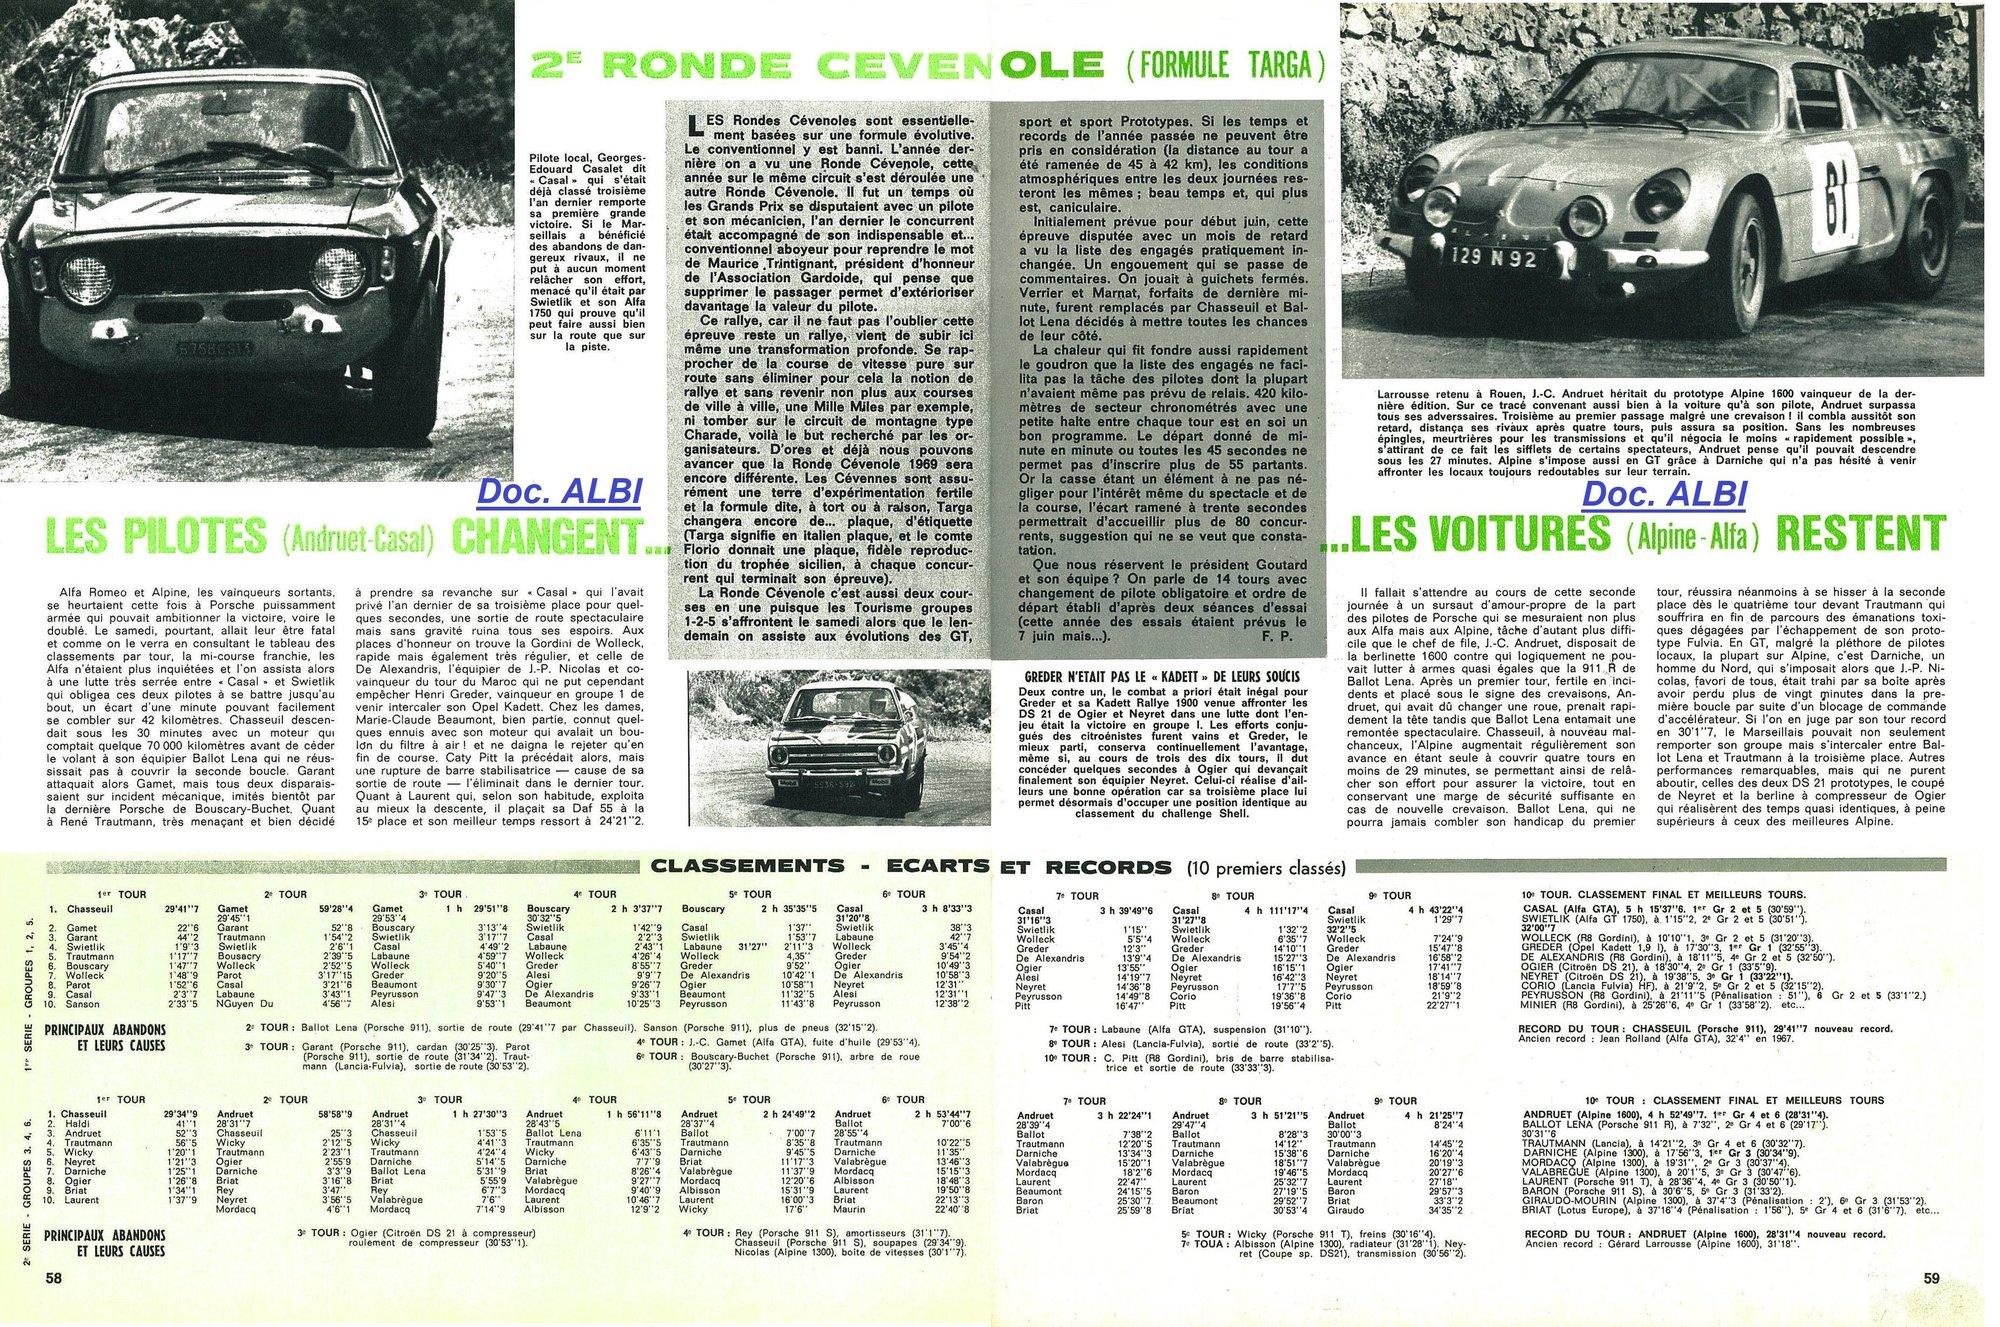 496016127_1968-09-lAutomobile-N268-23-24a.thumb.jpg.54a9dfba5cbba97b5c0ada0391abfd25.jpg